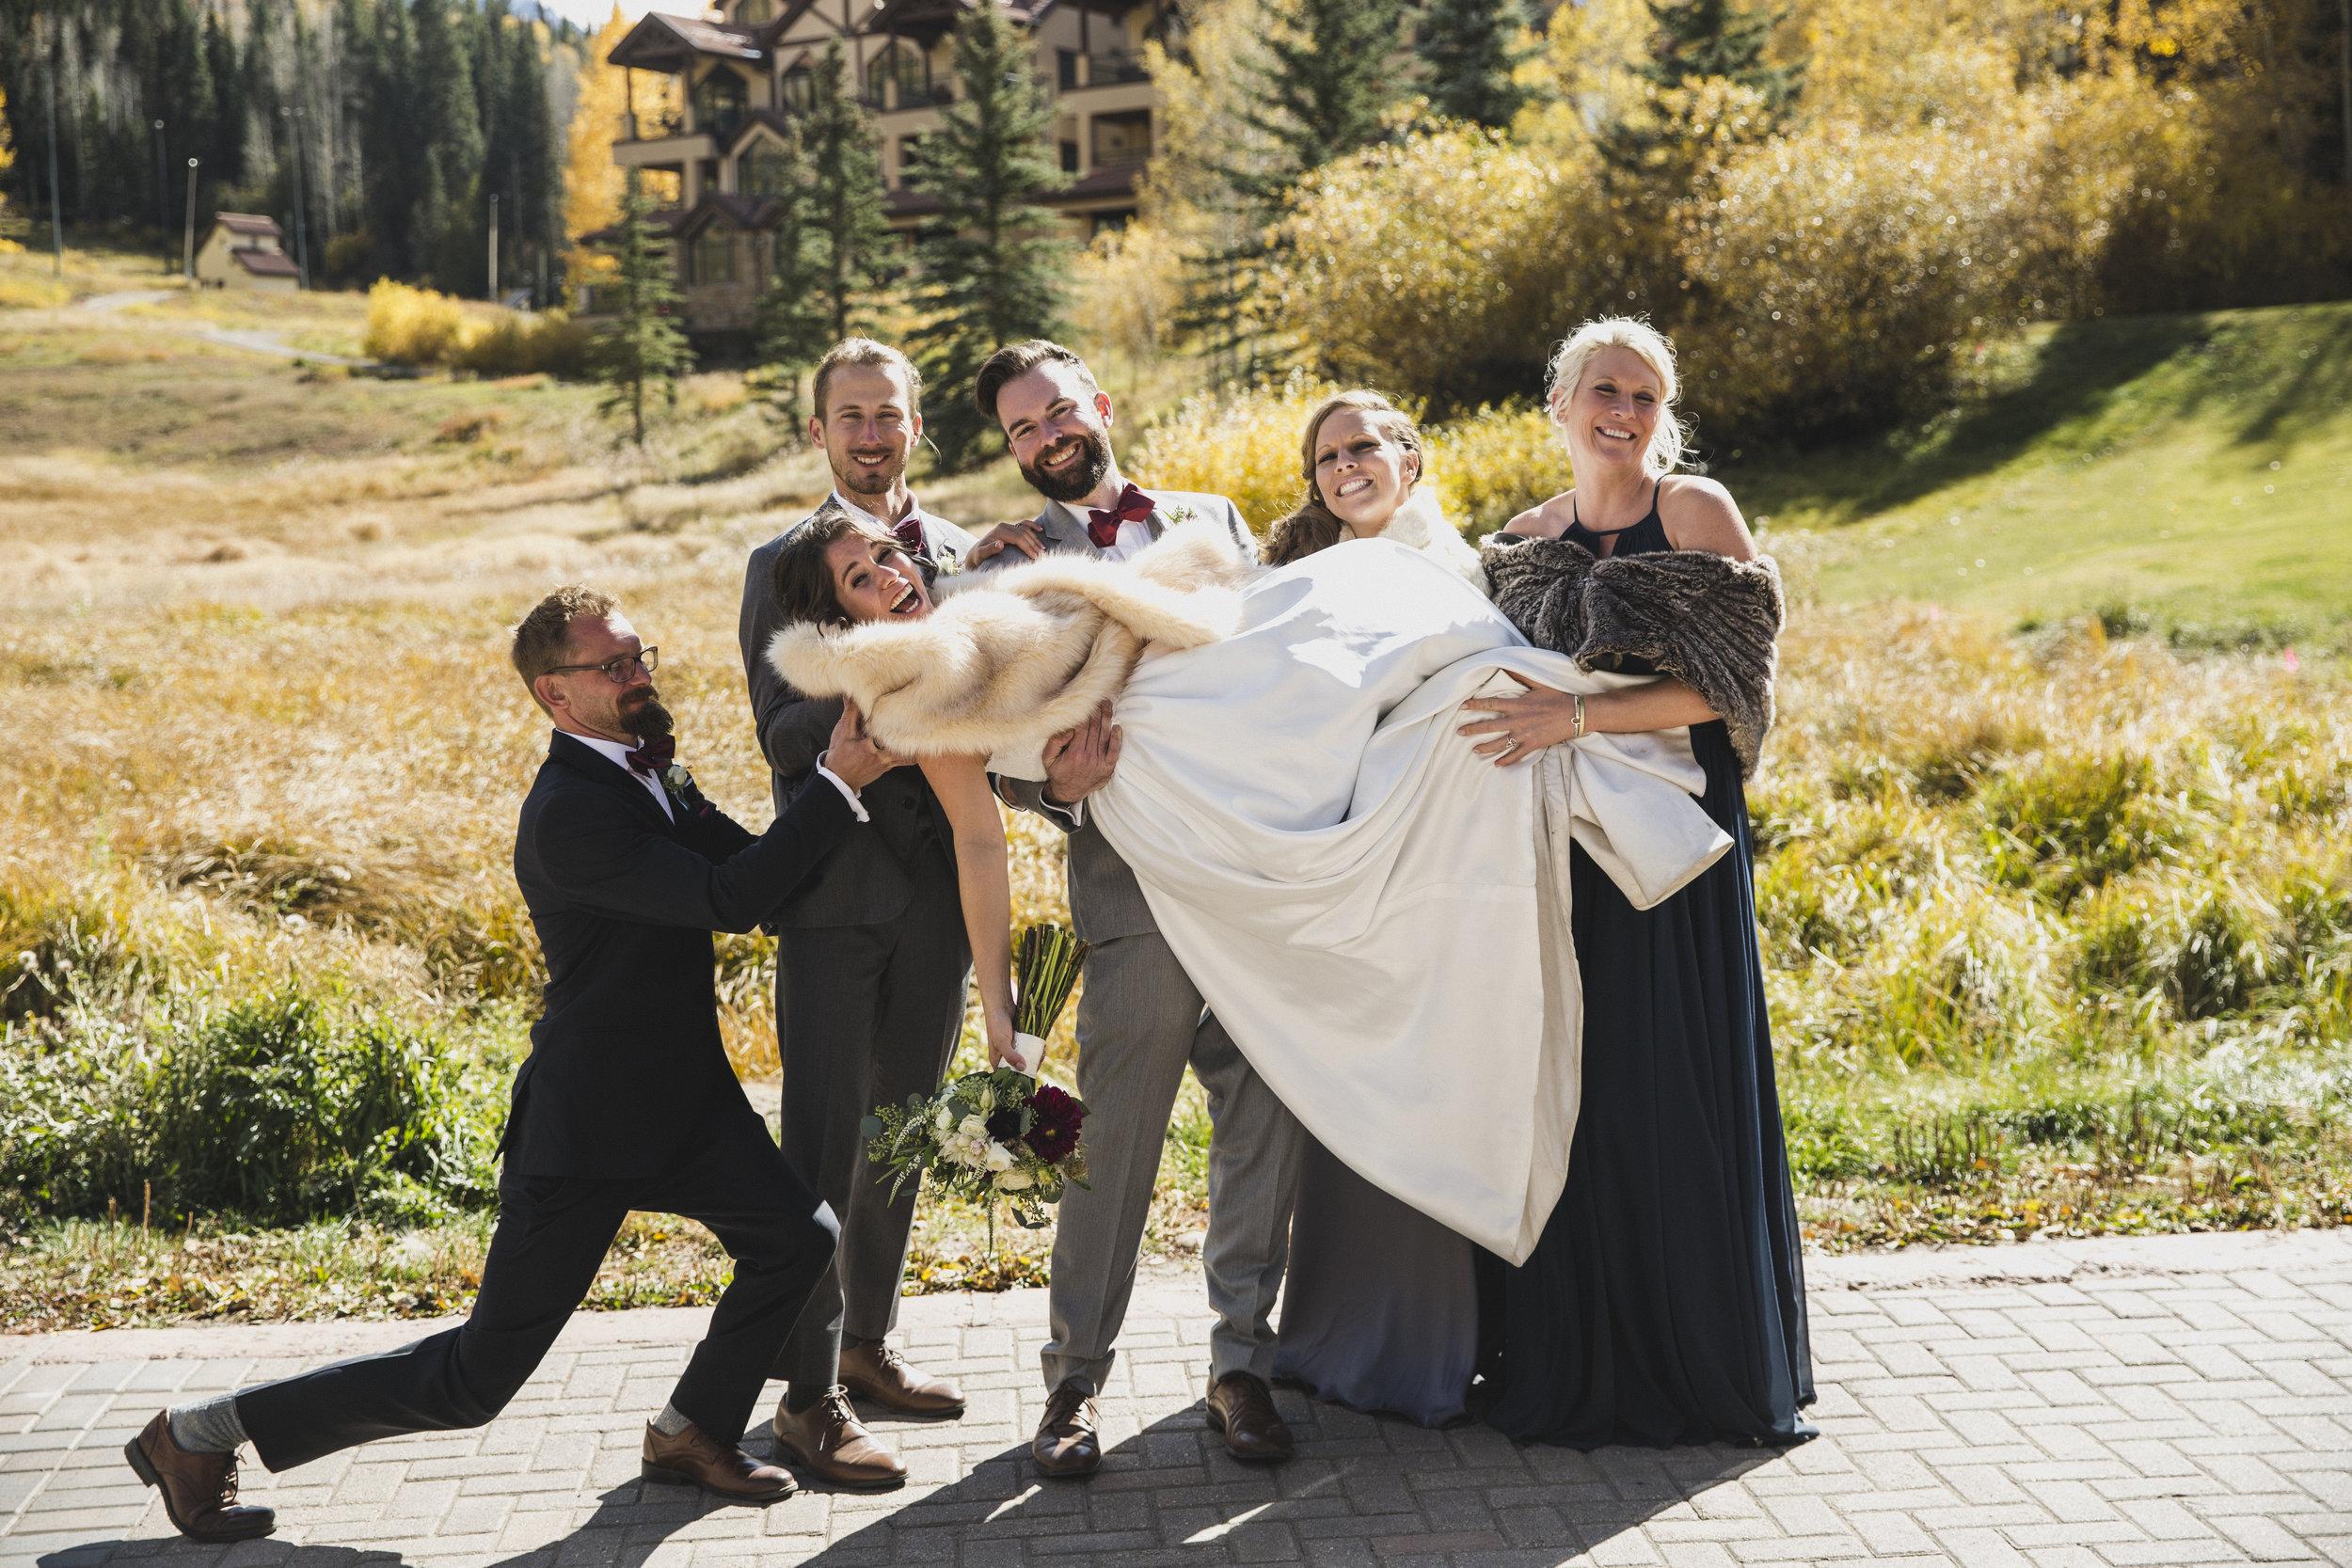 NE-LeahandAshtonphotography-Telluride-Wedding-Photography-9721.jpg